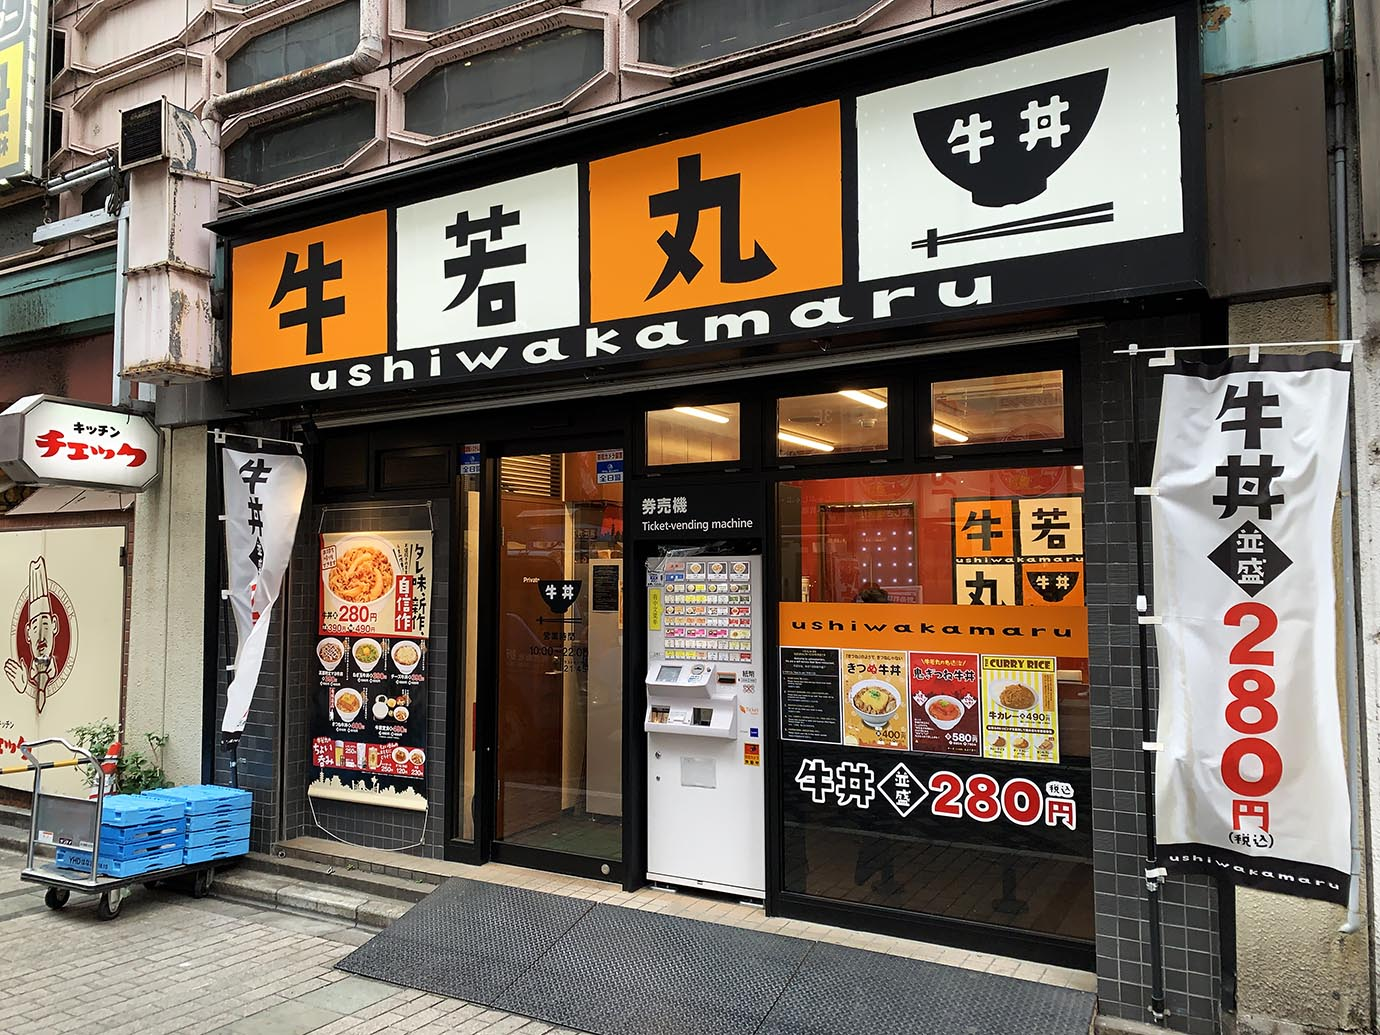 ushiwakamaru-yoshinoya-gyudon2